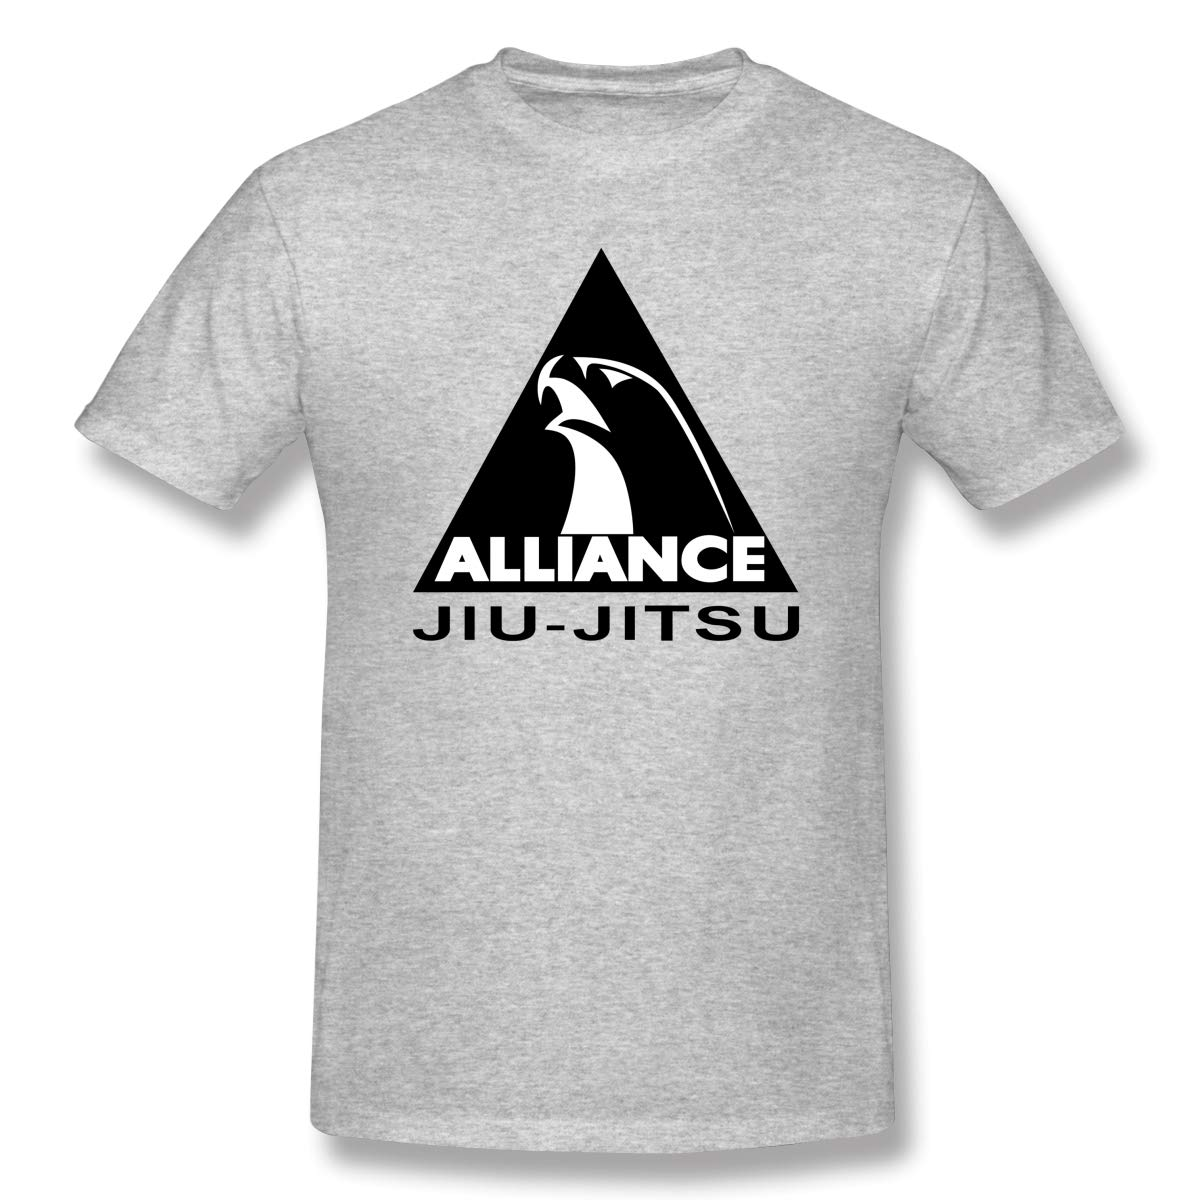 Spower Tee S Alliance Jiu Jitsu Casual T Shirts Gray With S Short Sleeve